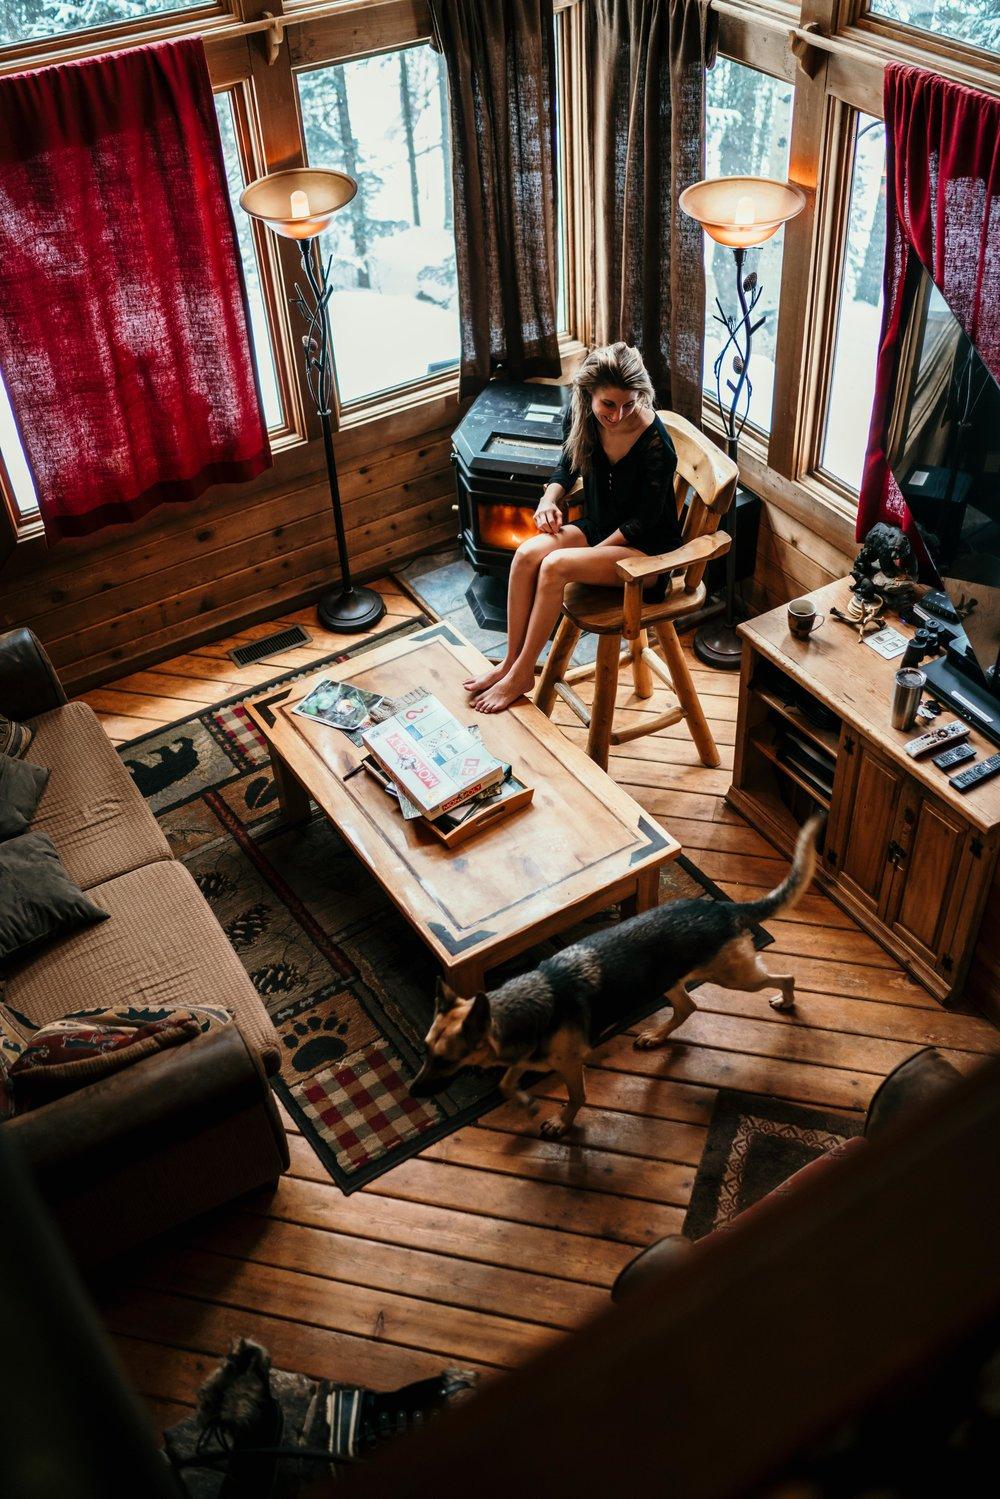 denver photographer cabin in the woods vacation -DSC01859.jpg